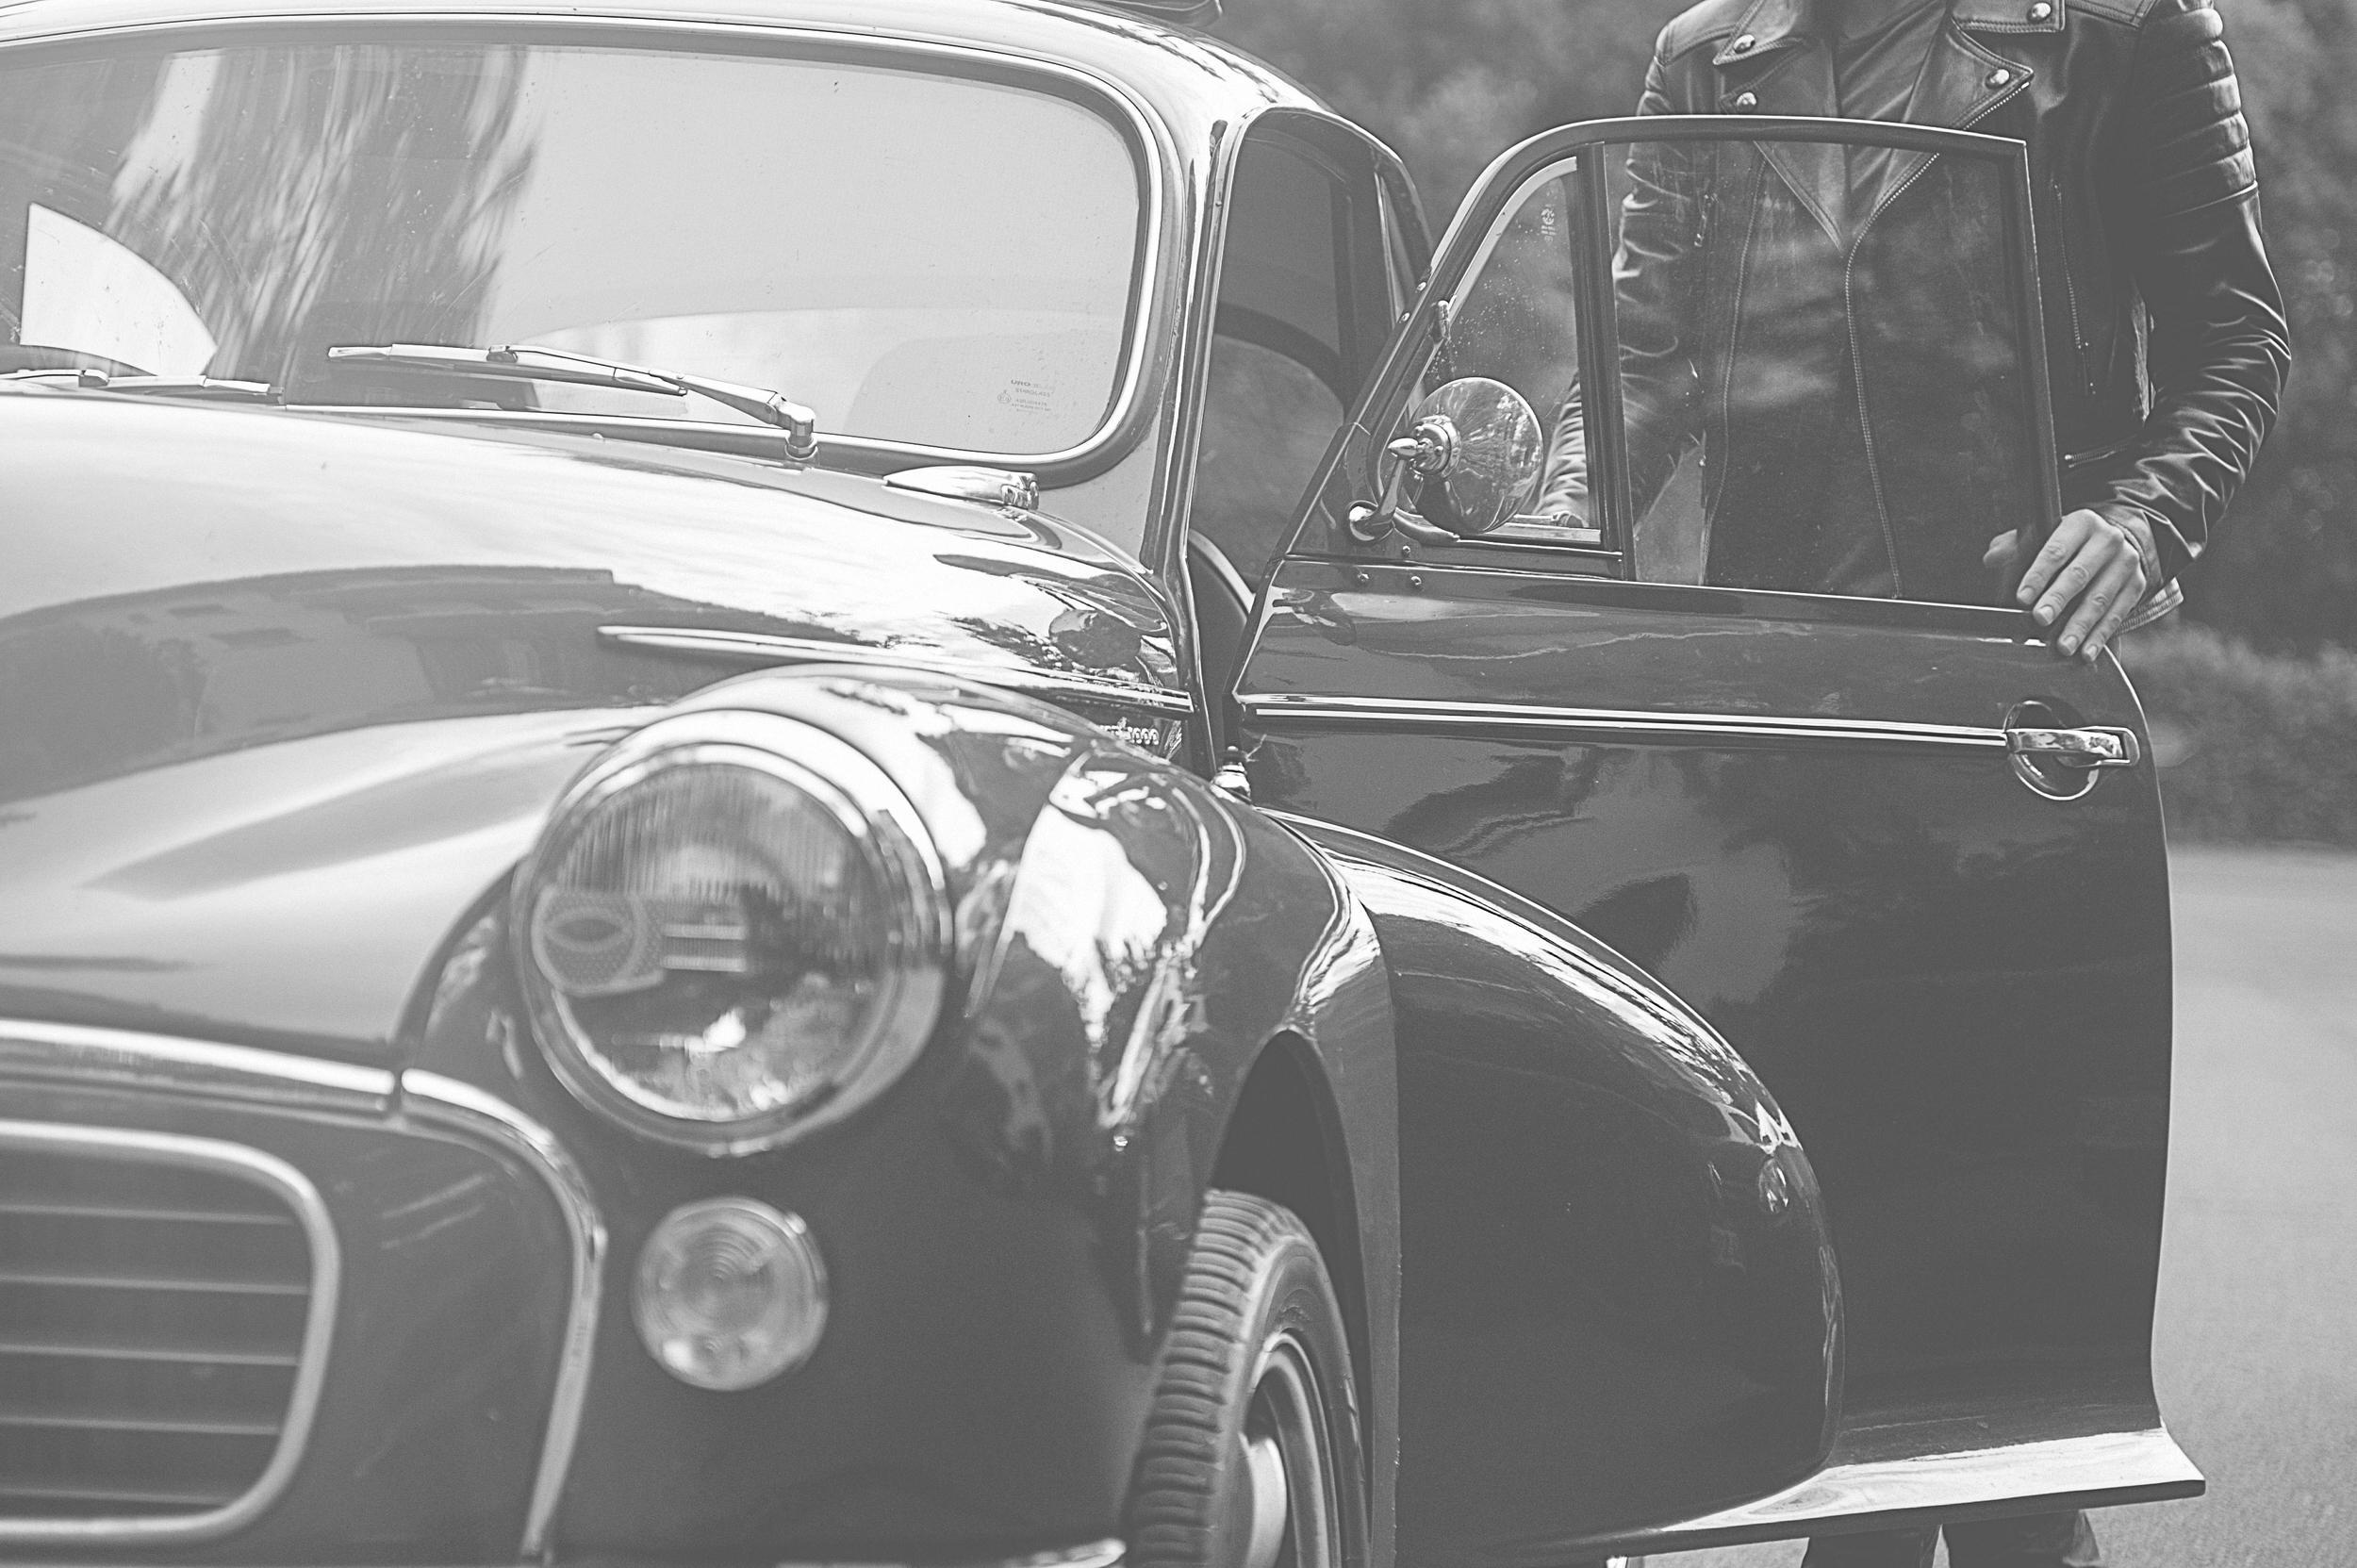 Retail Restauant design branding wayfinding signage achitect interior graphics uniform F&B packaging window VM Experiance Pop up fast food fashion glamping pods photography menswear womenswear harrods plus kitchen prototype logo griffin loveland farm weld enamel pizza coffe bar cafe signwritting graffiti beauty hall sweetmaker pappabubble protoype no1 quirky collective rake istanbul bookshop burger burgerlab display belstaff timber brick joinery shopfit shopfitting cafe london Film Styling art direction art direction producer production photograph photo shoot photoshoot wheels and waves l'equipee motorbikes motorcycles sunglasses belstaff bellstaff france morris minor